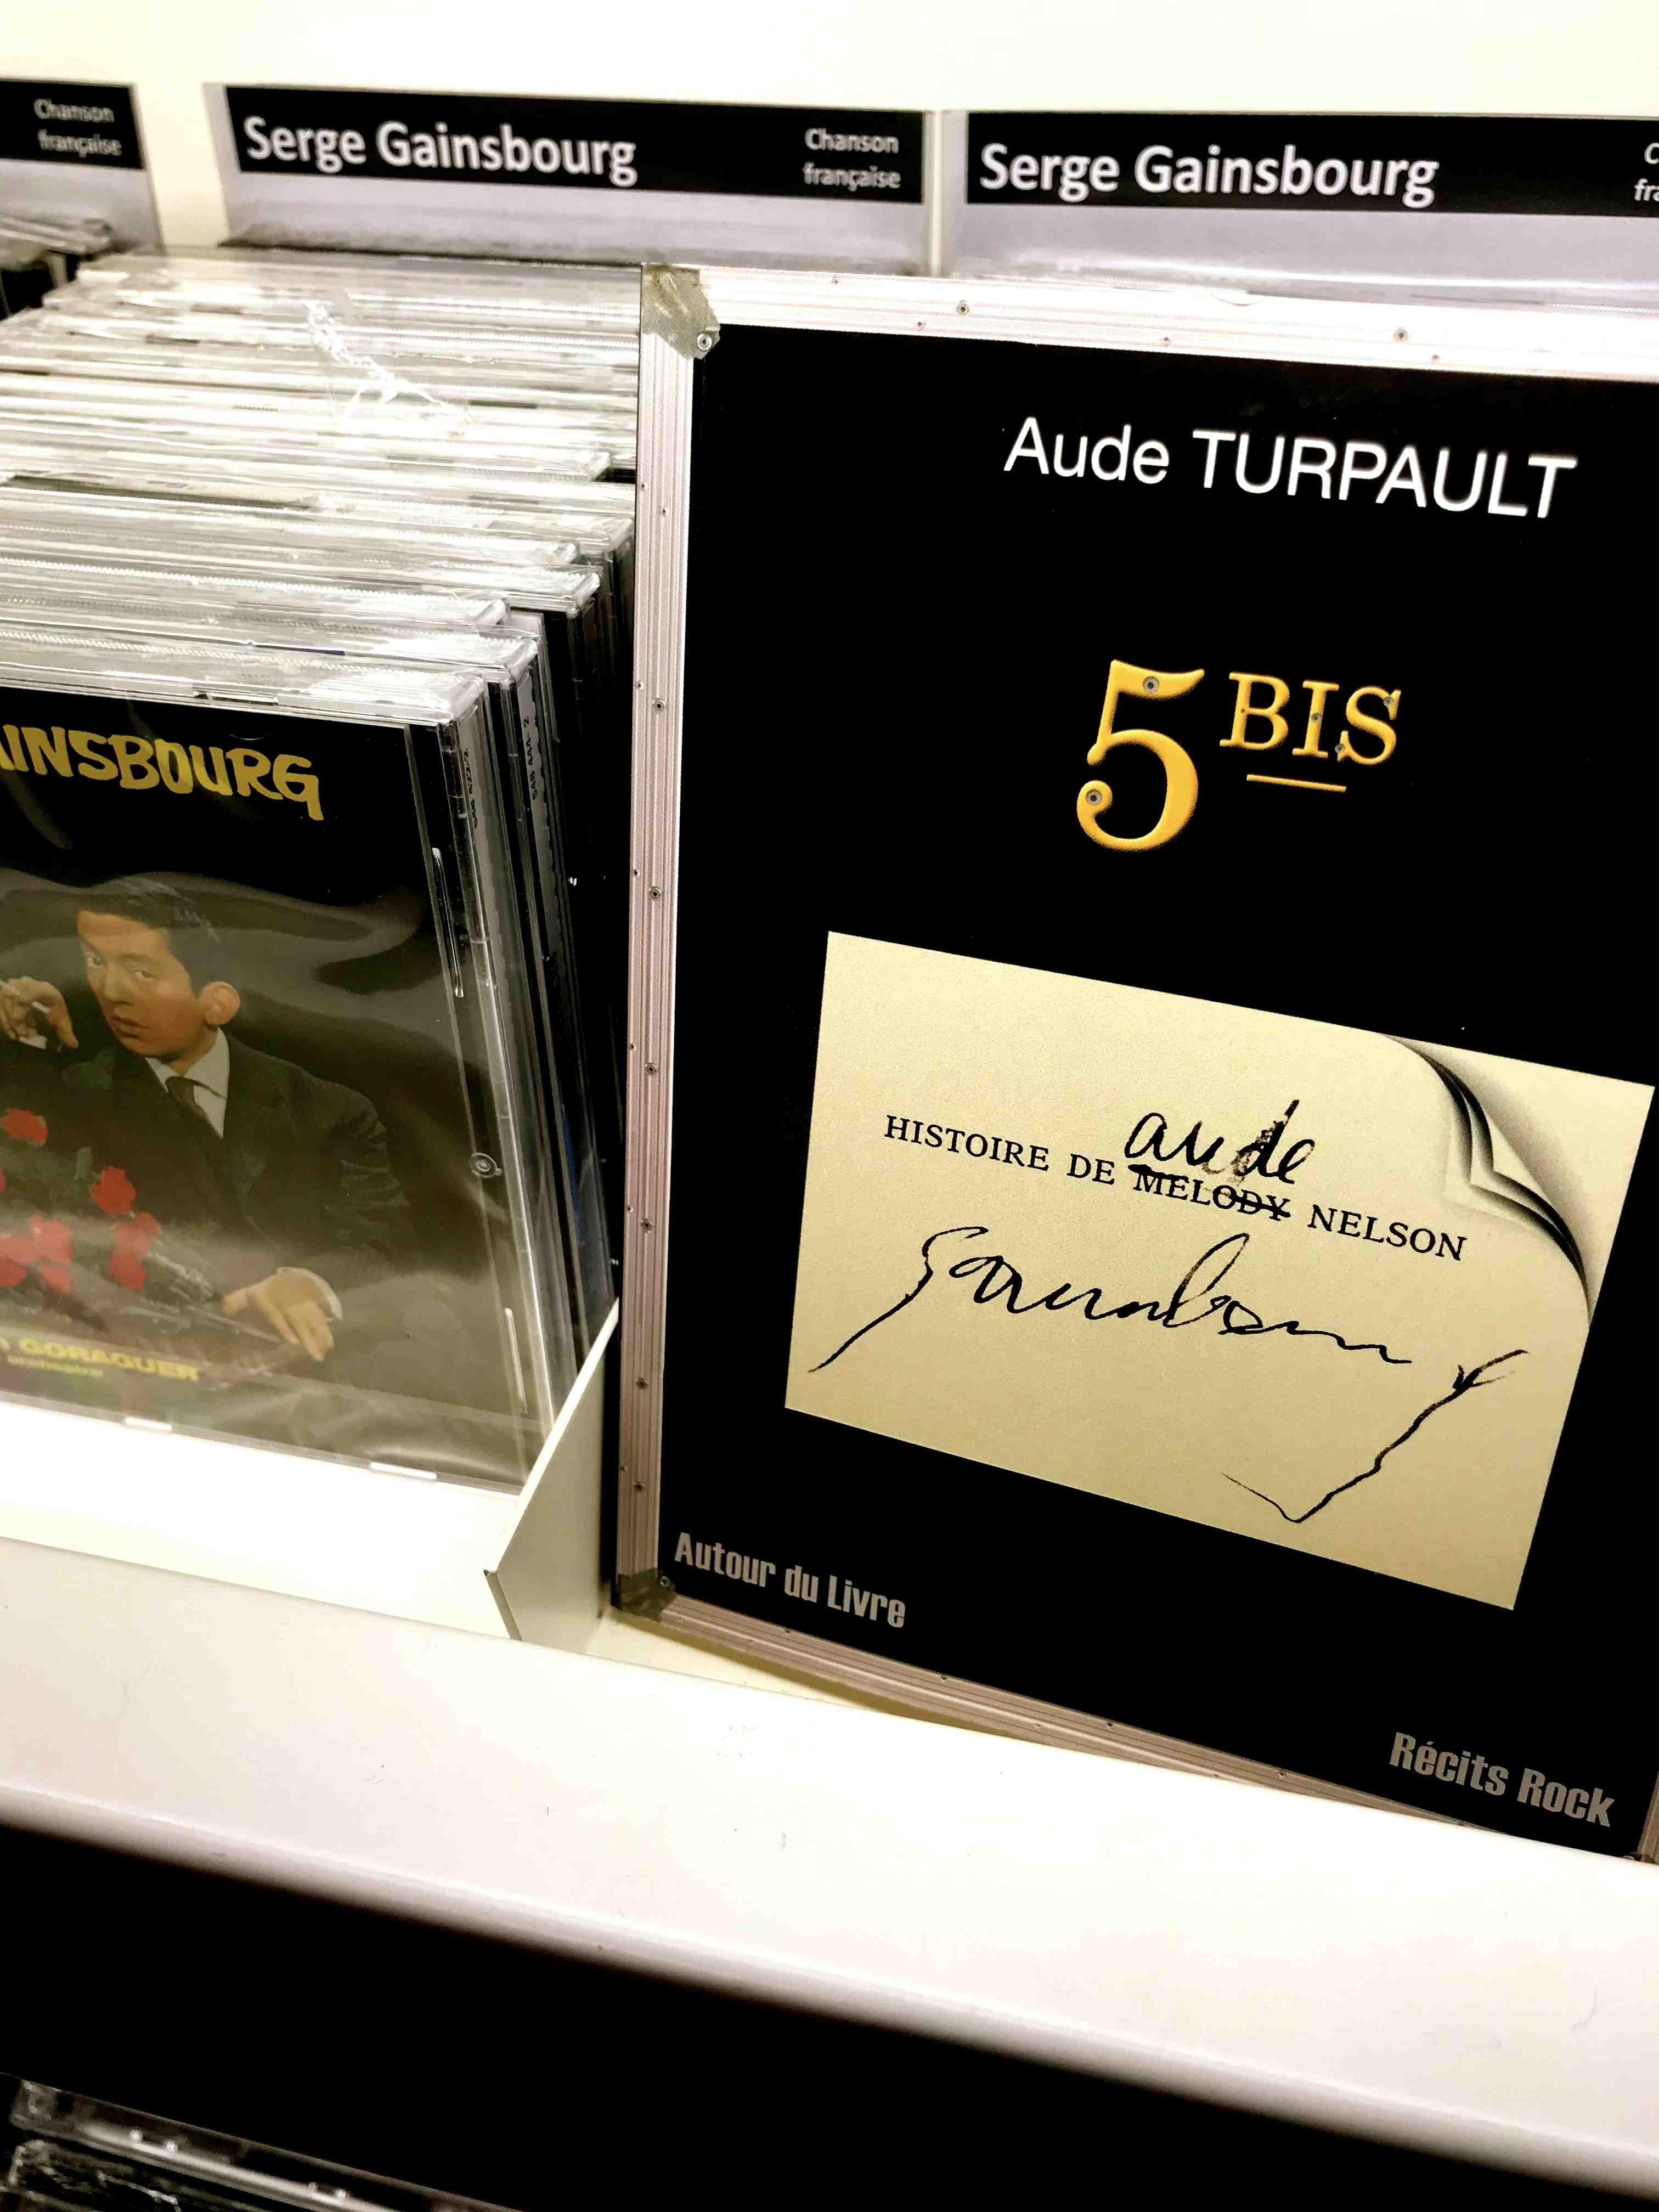 Aude Turpault.